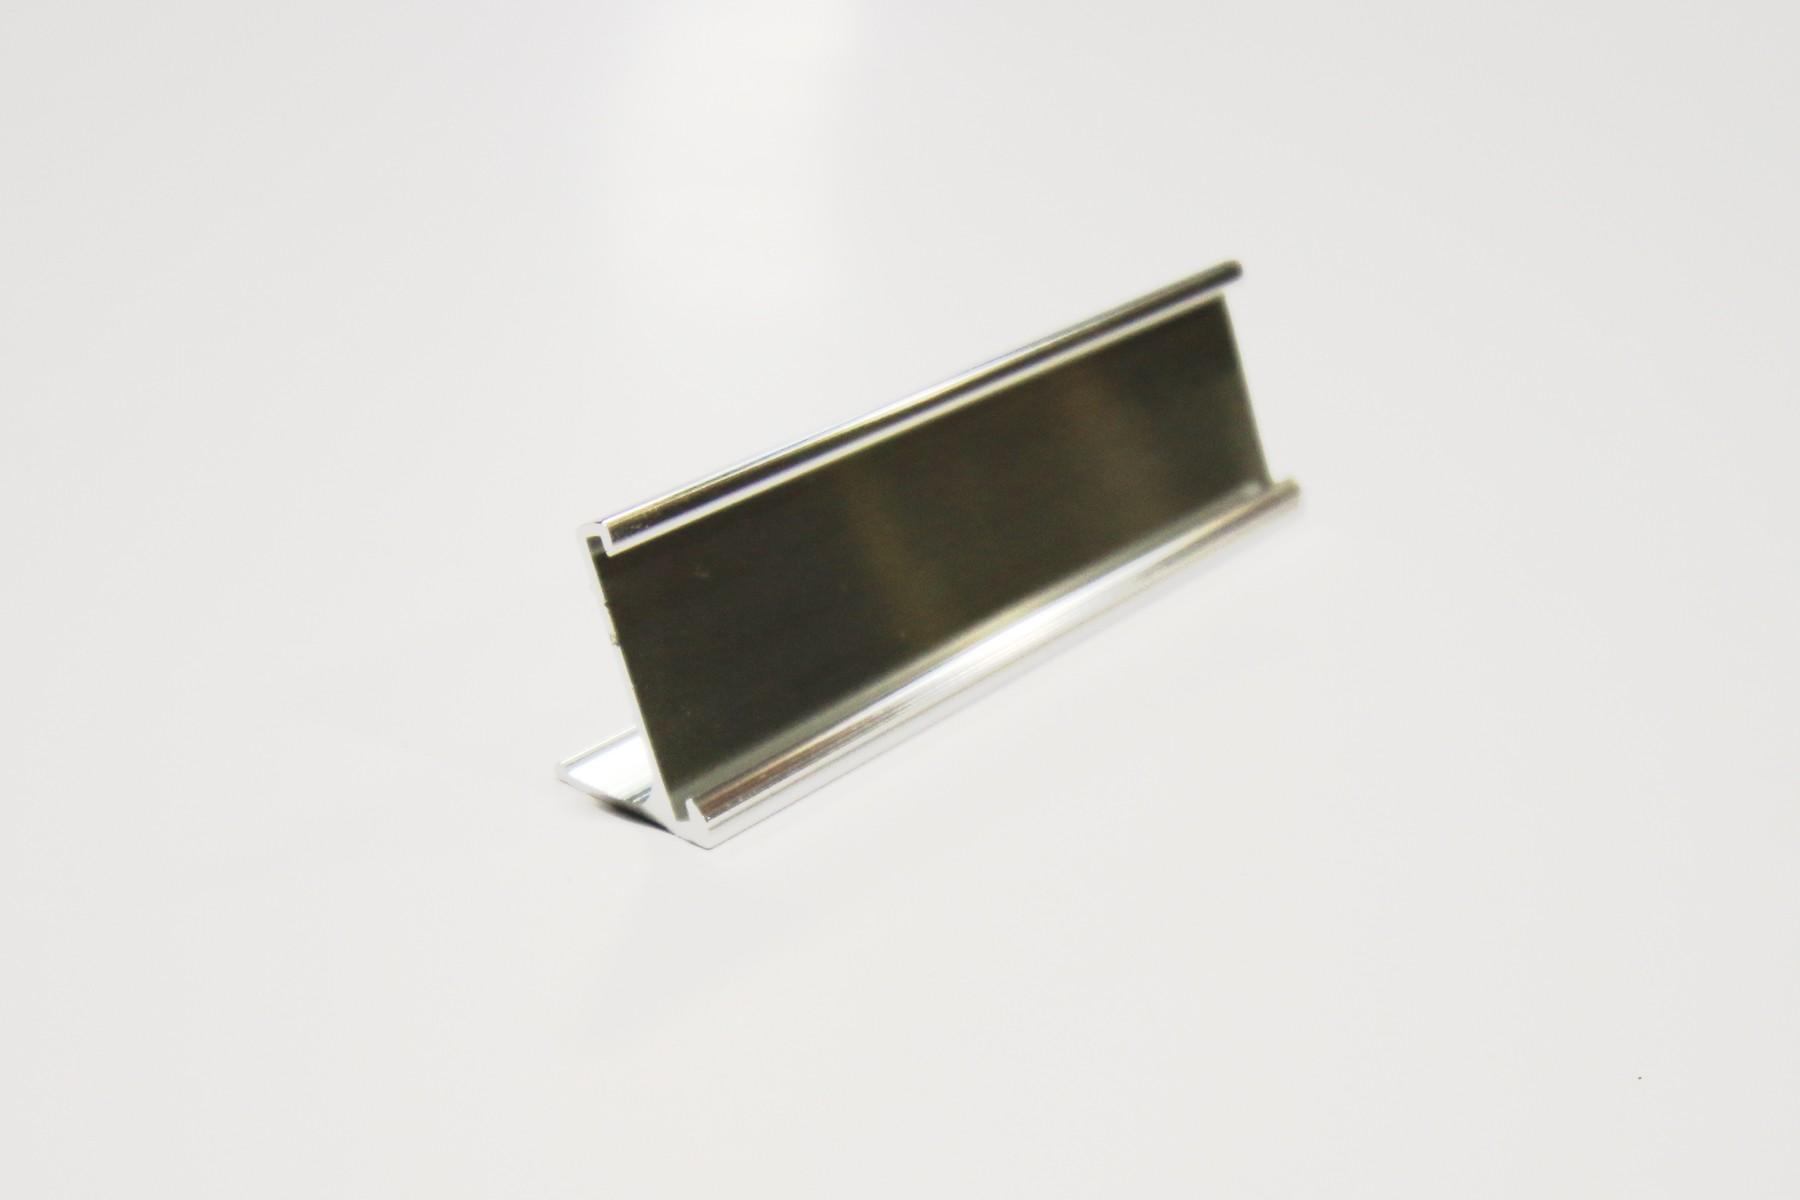 1 x 8 Desk Holder, Silver